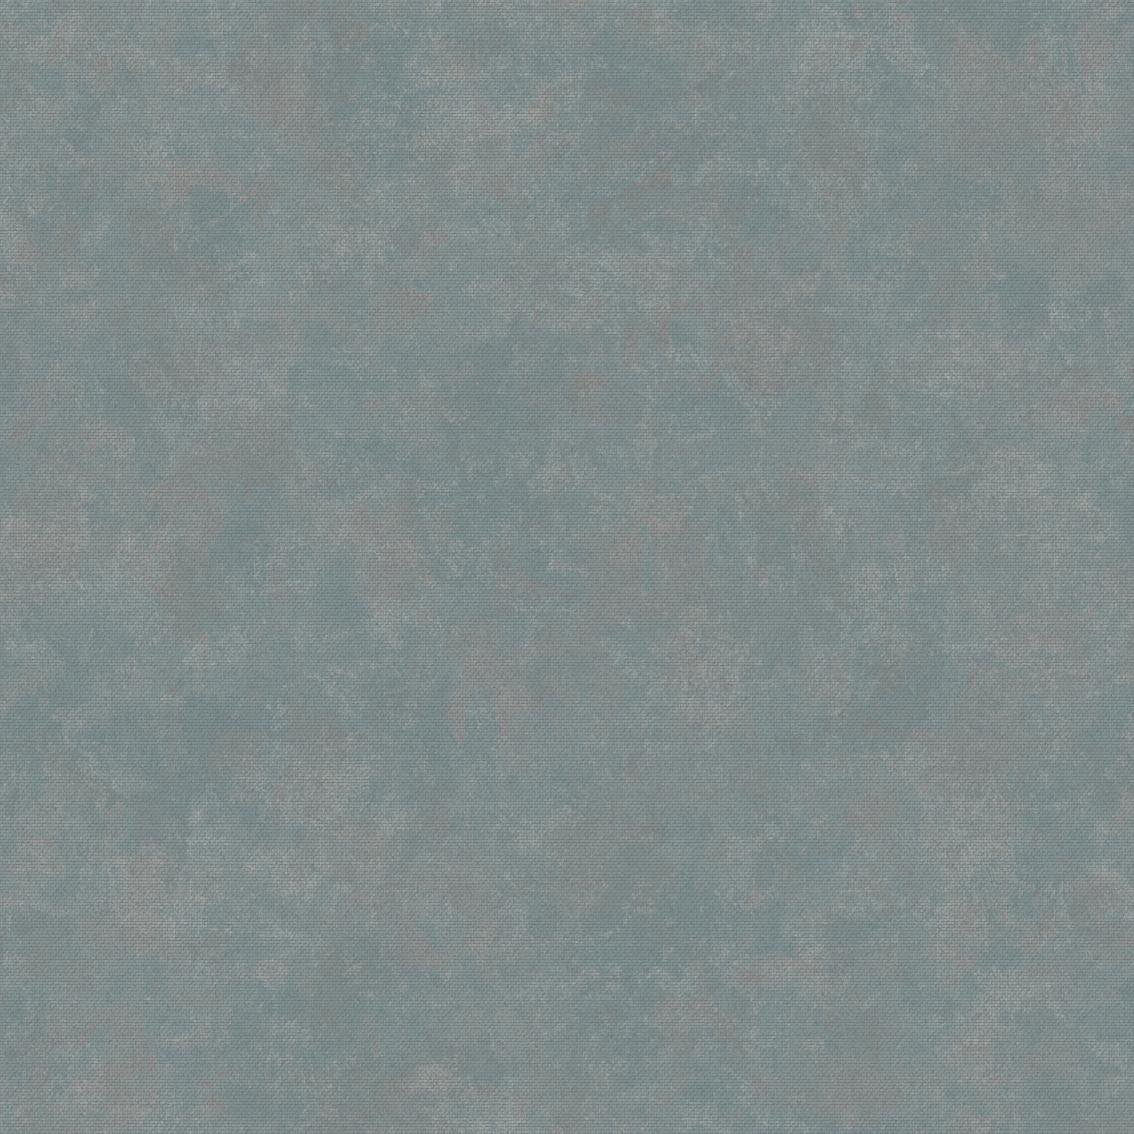 Бельгийские обои Decoprint,  коллекция Calico, артикулCL16011